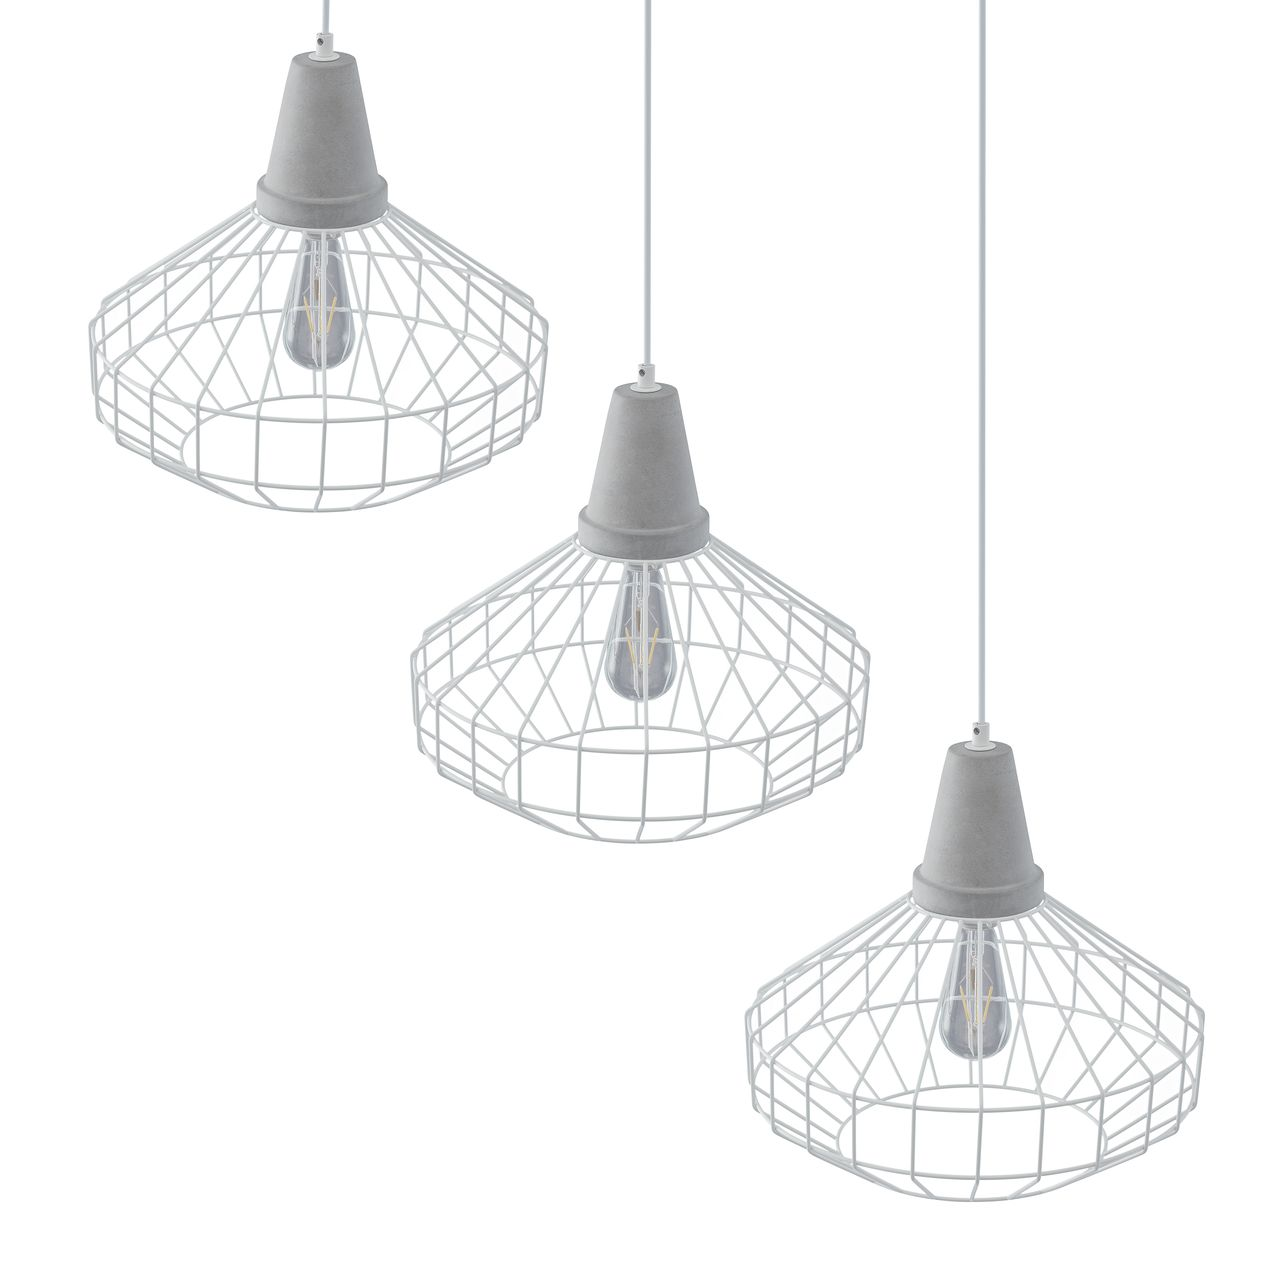 SEI Brinland Cage Pendant Lamp in White / Cement Gray - Set of 3